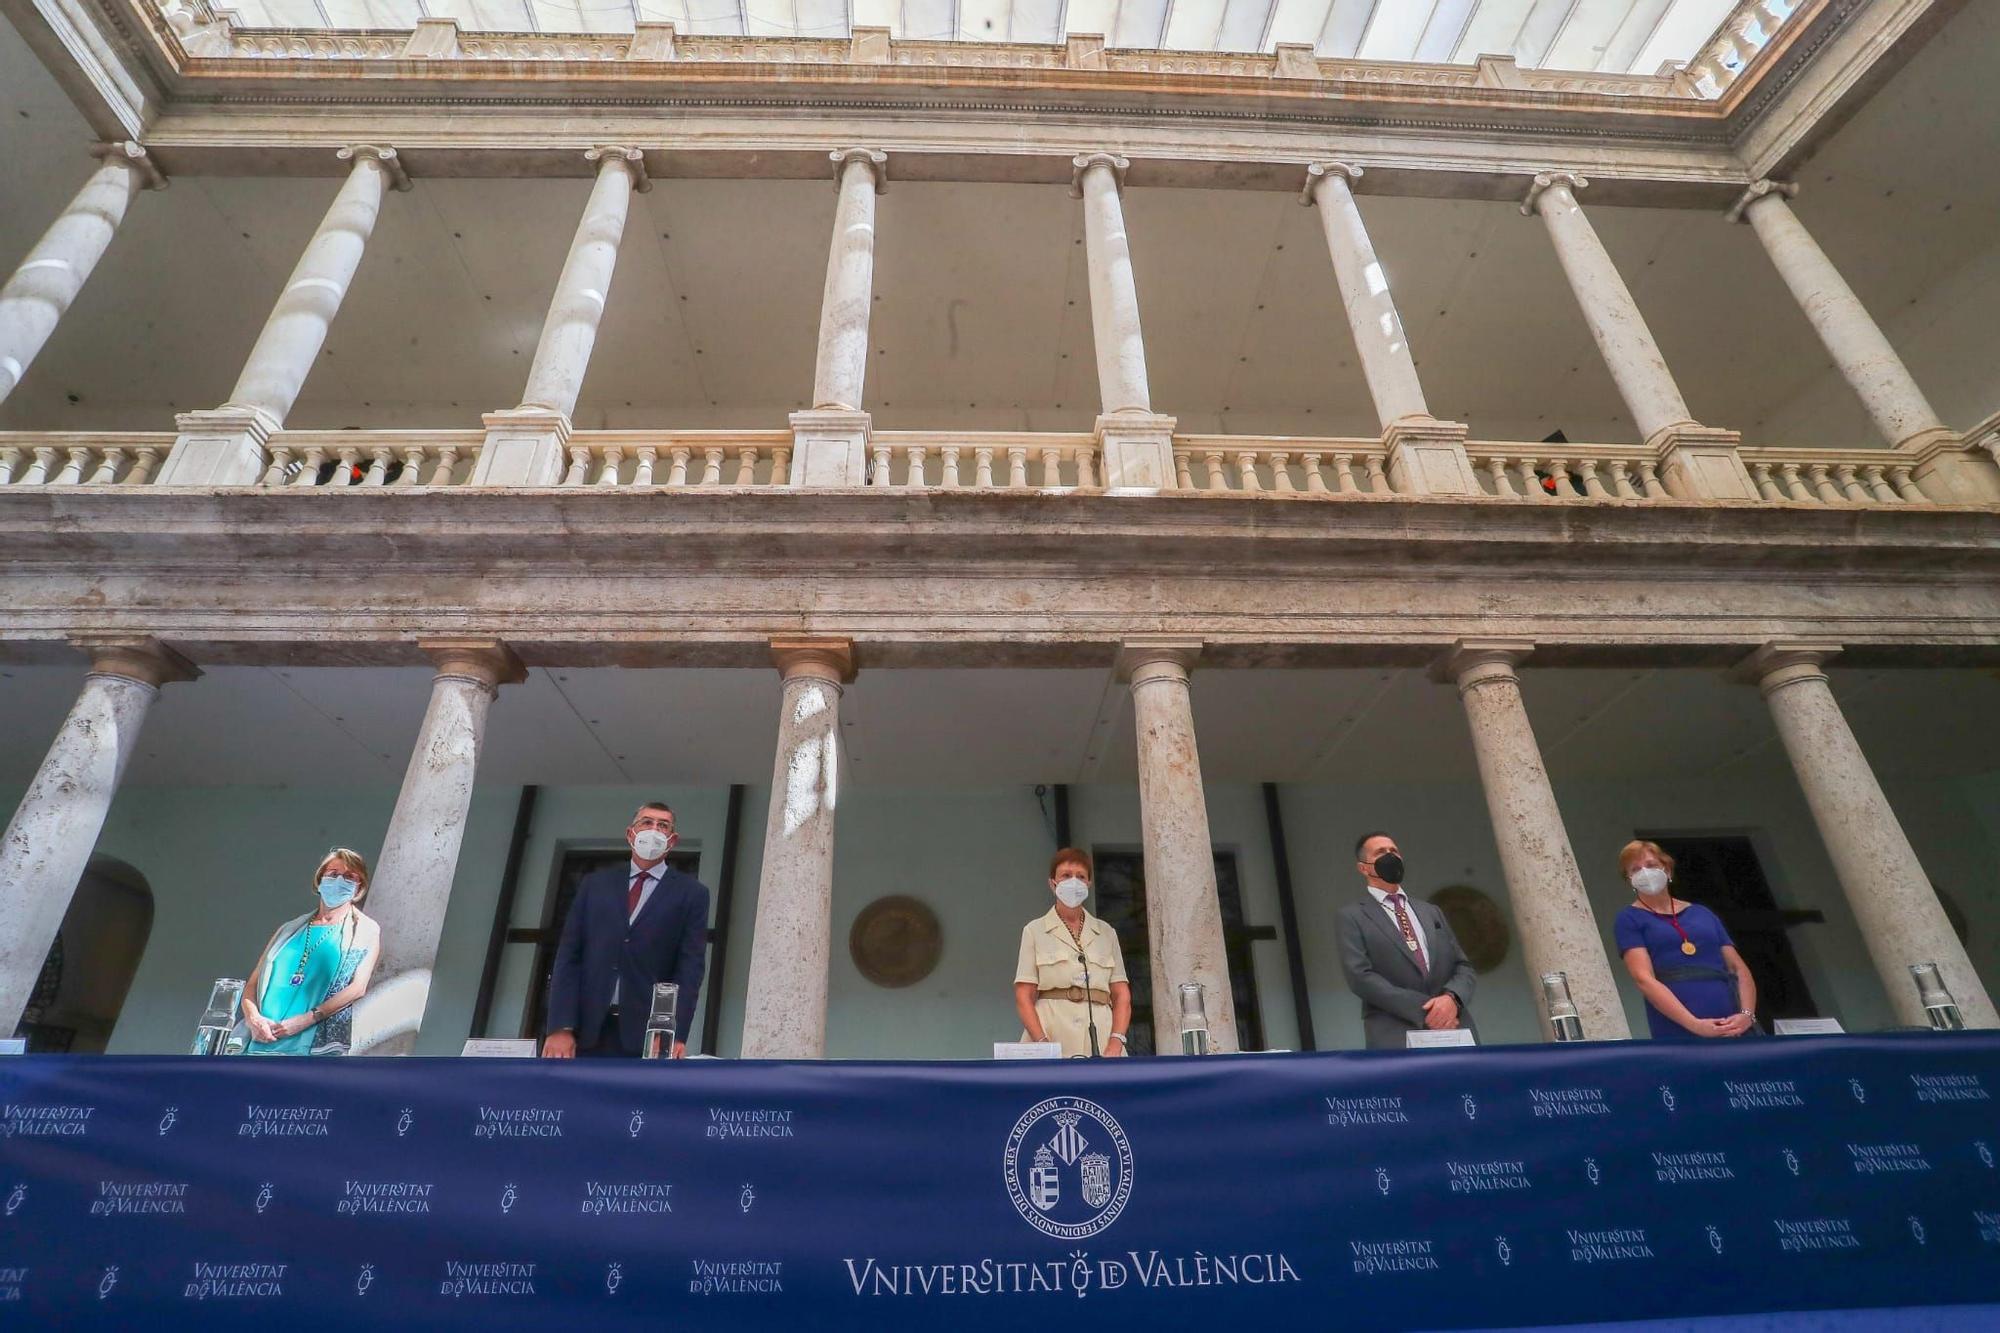 lnicio de curso de la Universitat de València